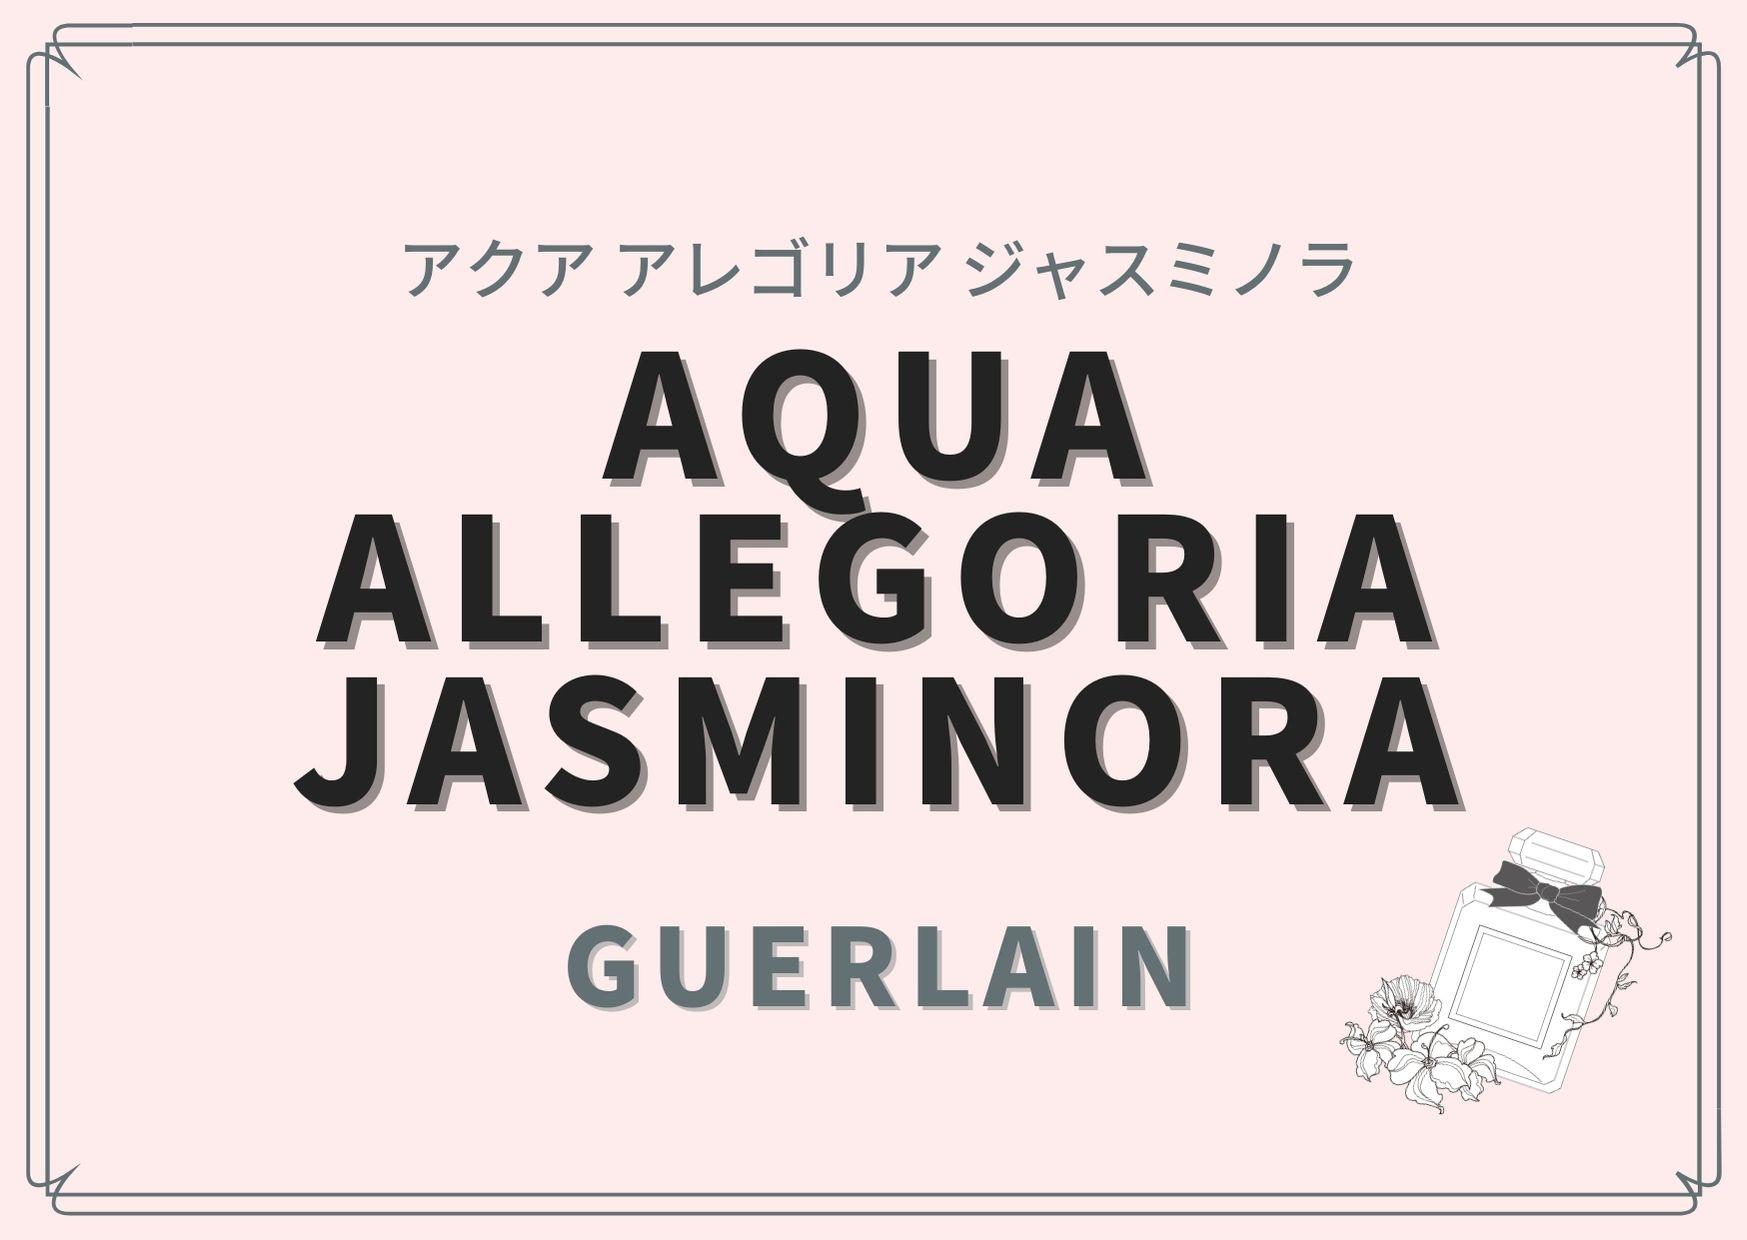 Aqua Allegoria Jasminora(アクア アレゴリア ジャスミノラ)/GUERLAIN(ゲラン)